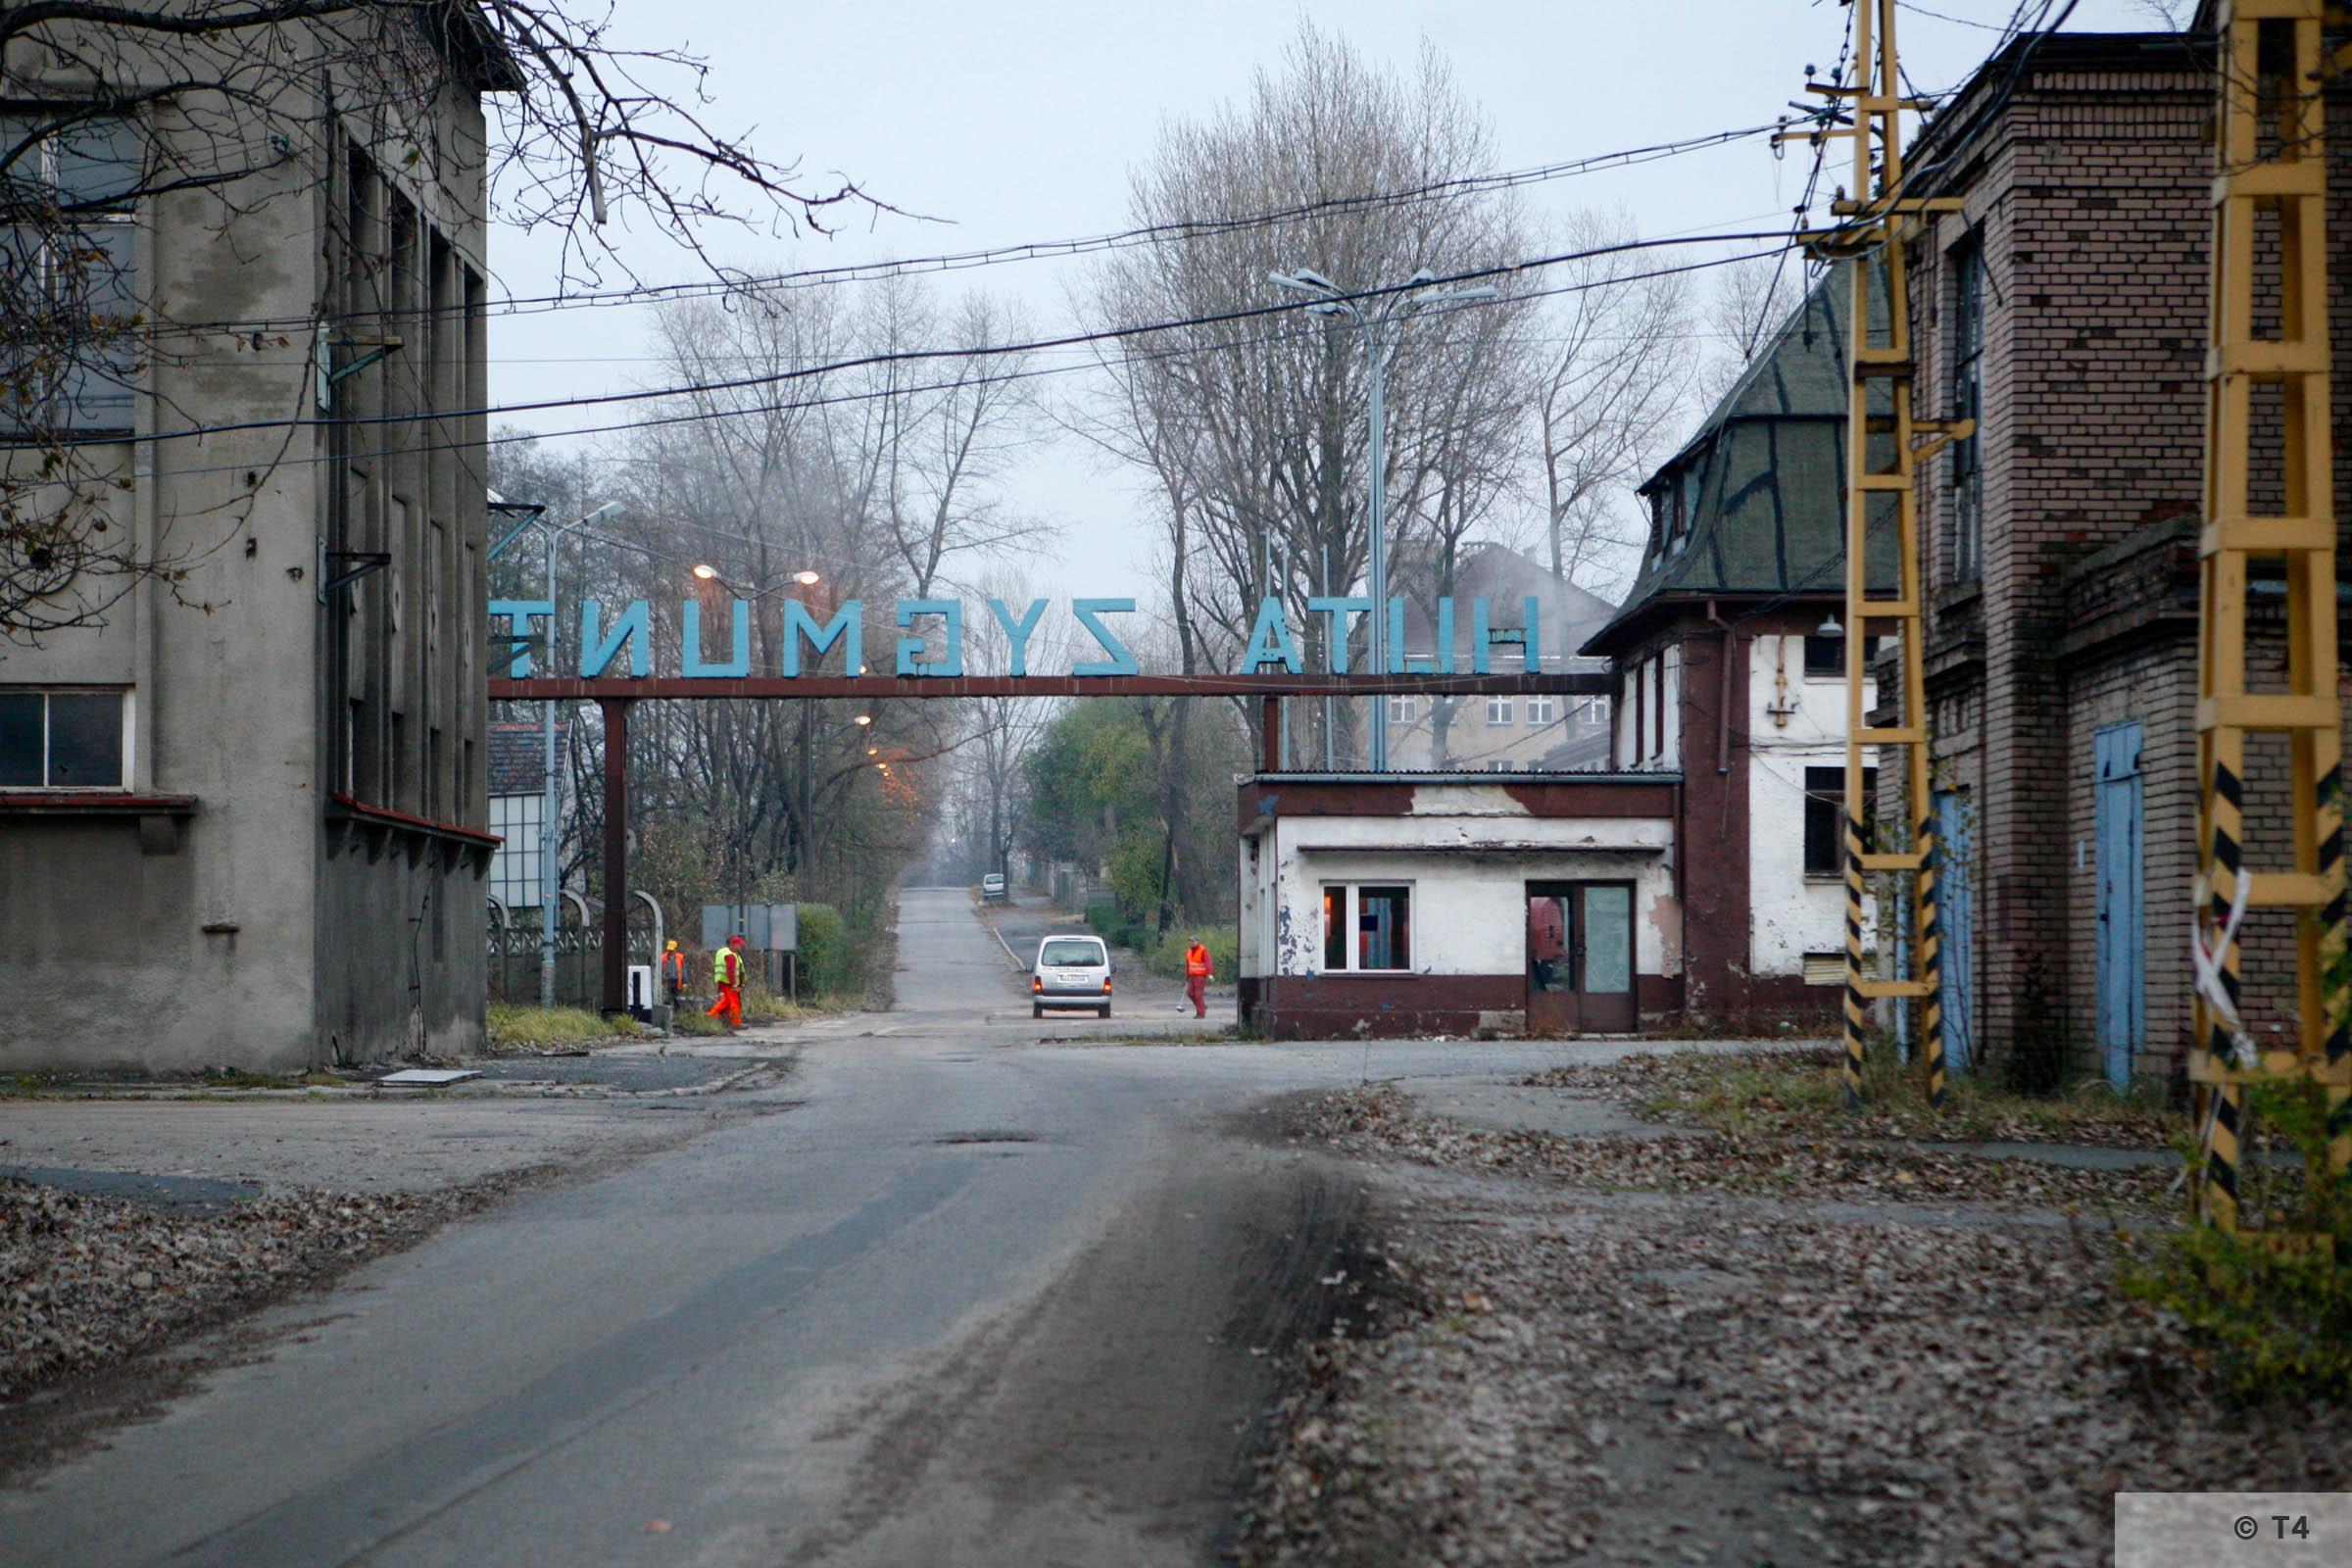 Zygmunt steel works main entrance. 2006 T4 4870